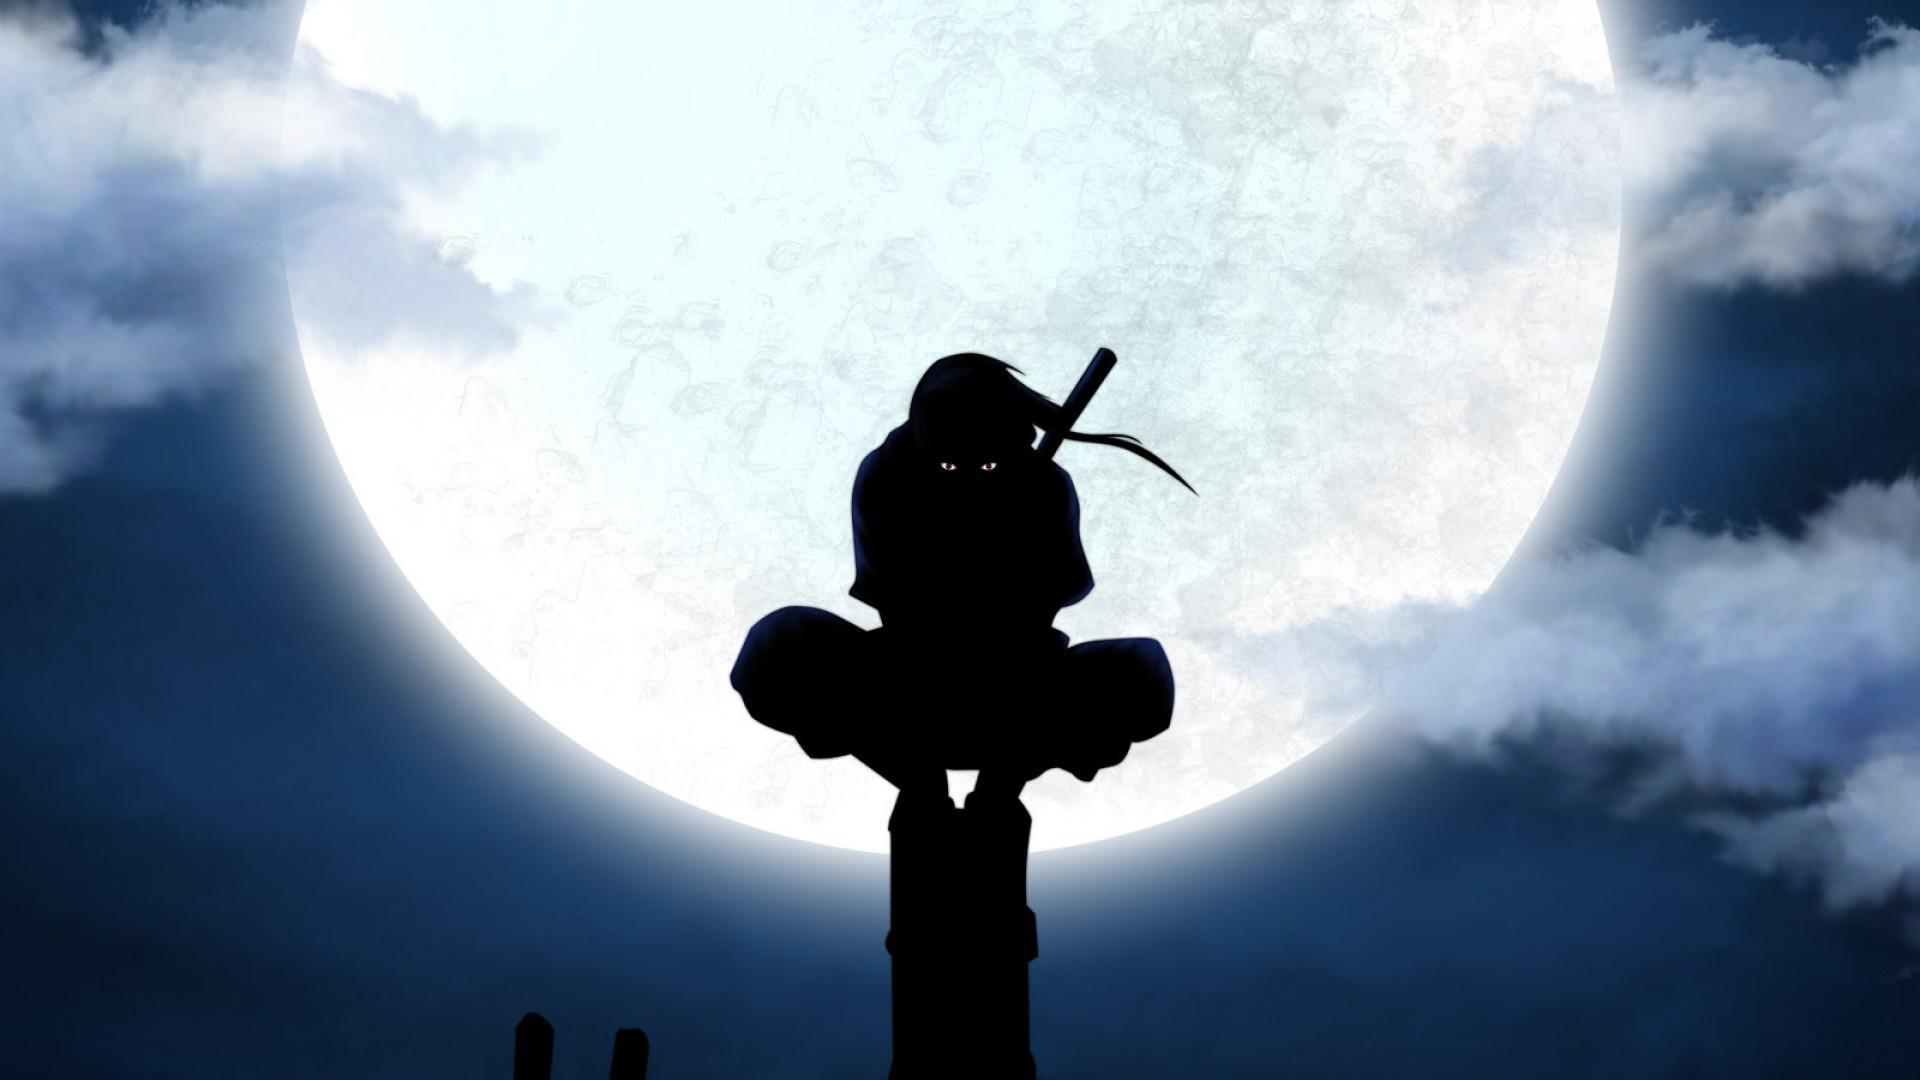 Uchiha Itachi ANBU Silhouette Moon Anime Utility Pole 1920x1080